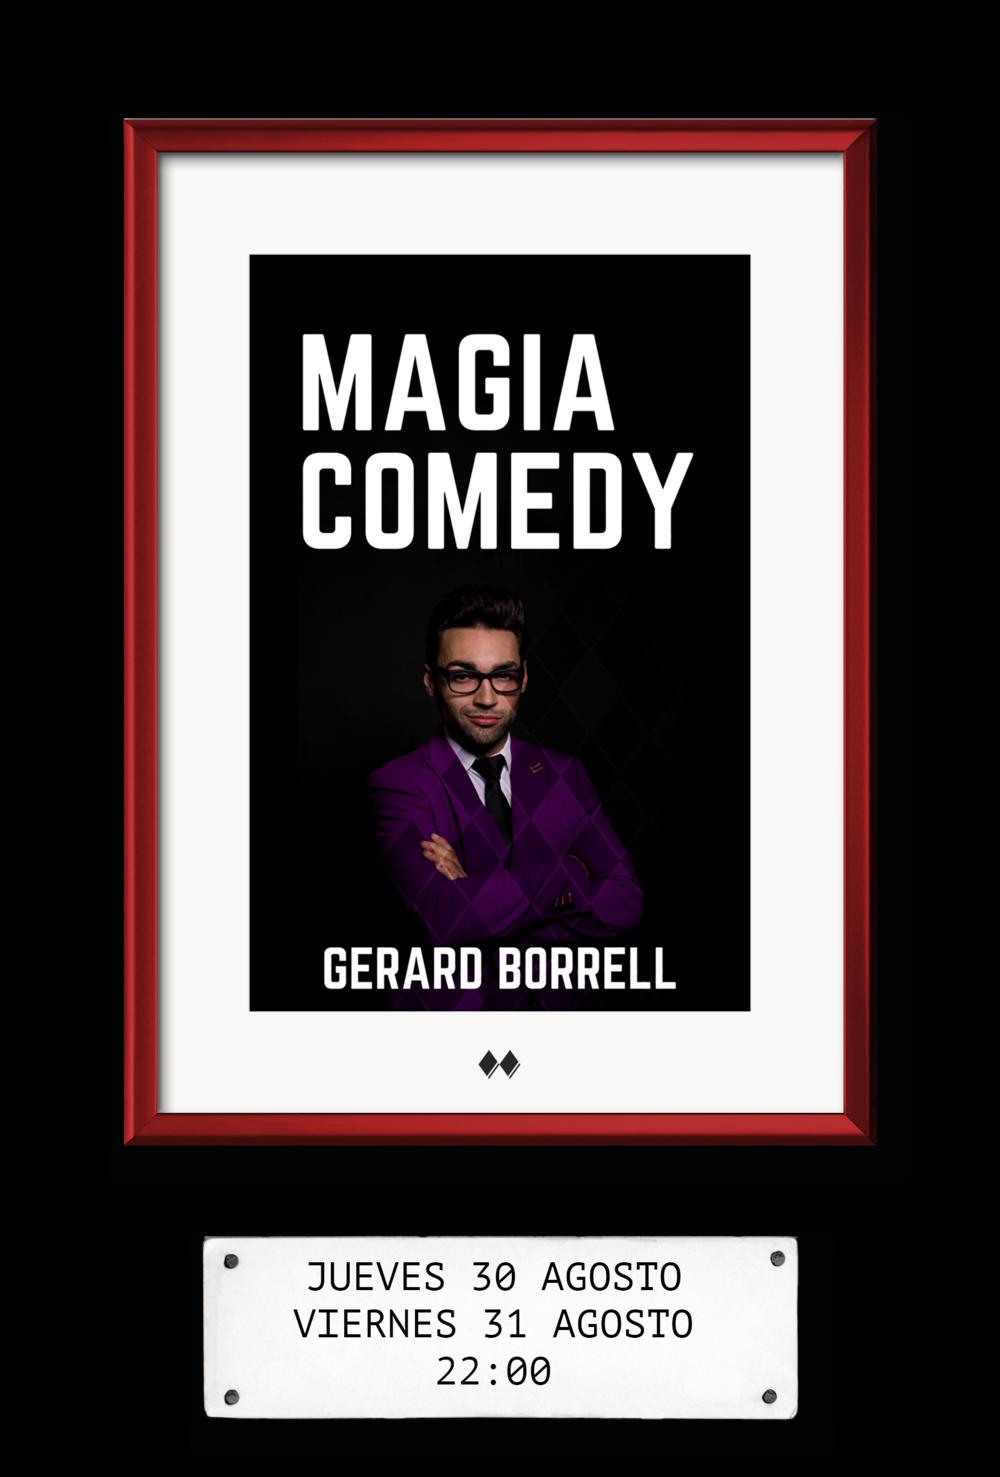 cuadro-gerard-borrel-magic-comedy-magia-comedia-madrid-teatro-arlequin-gran-via-comprar-entradas.png